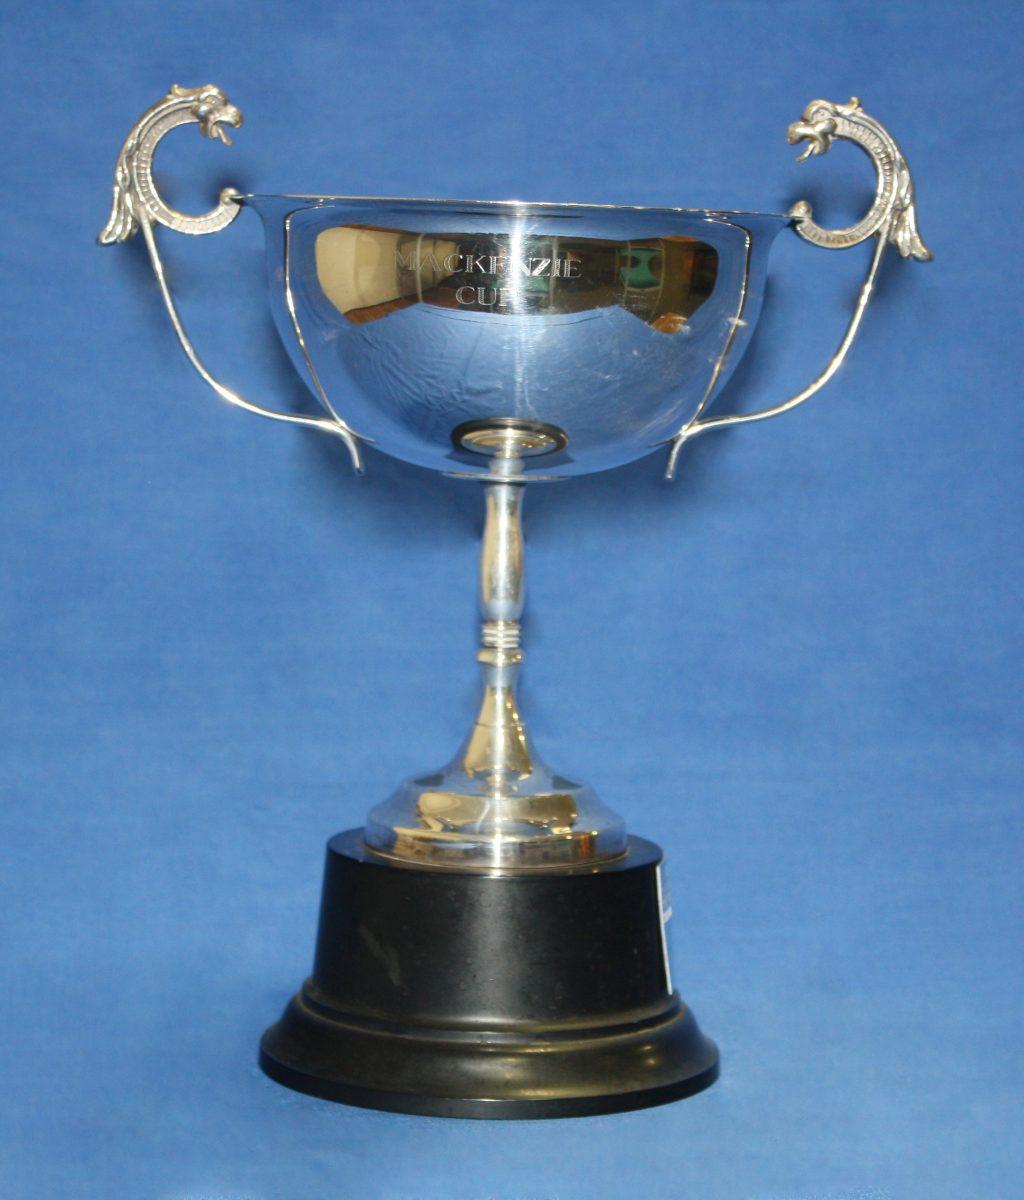 McKenzie Cup